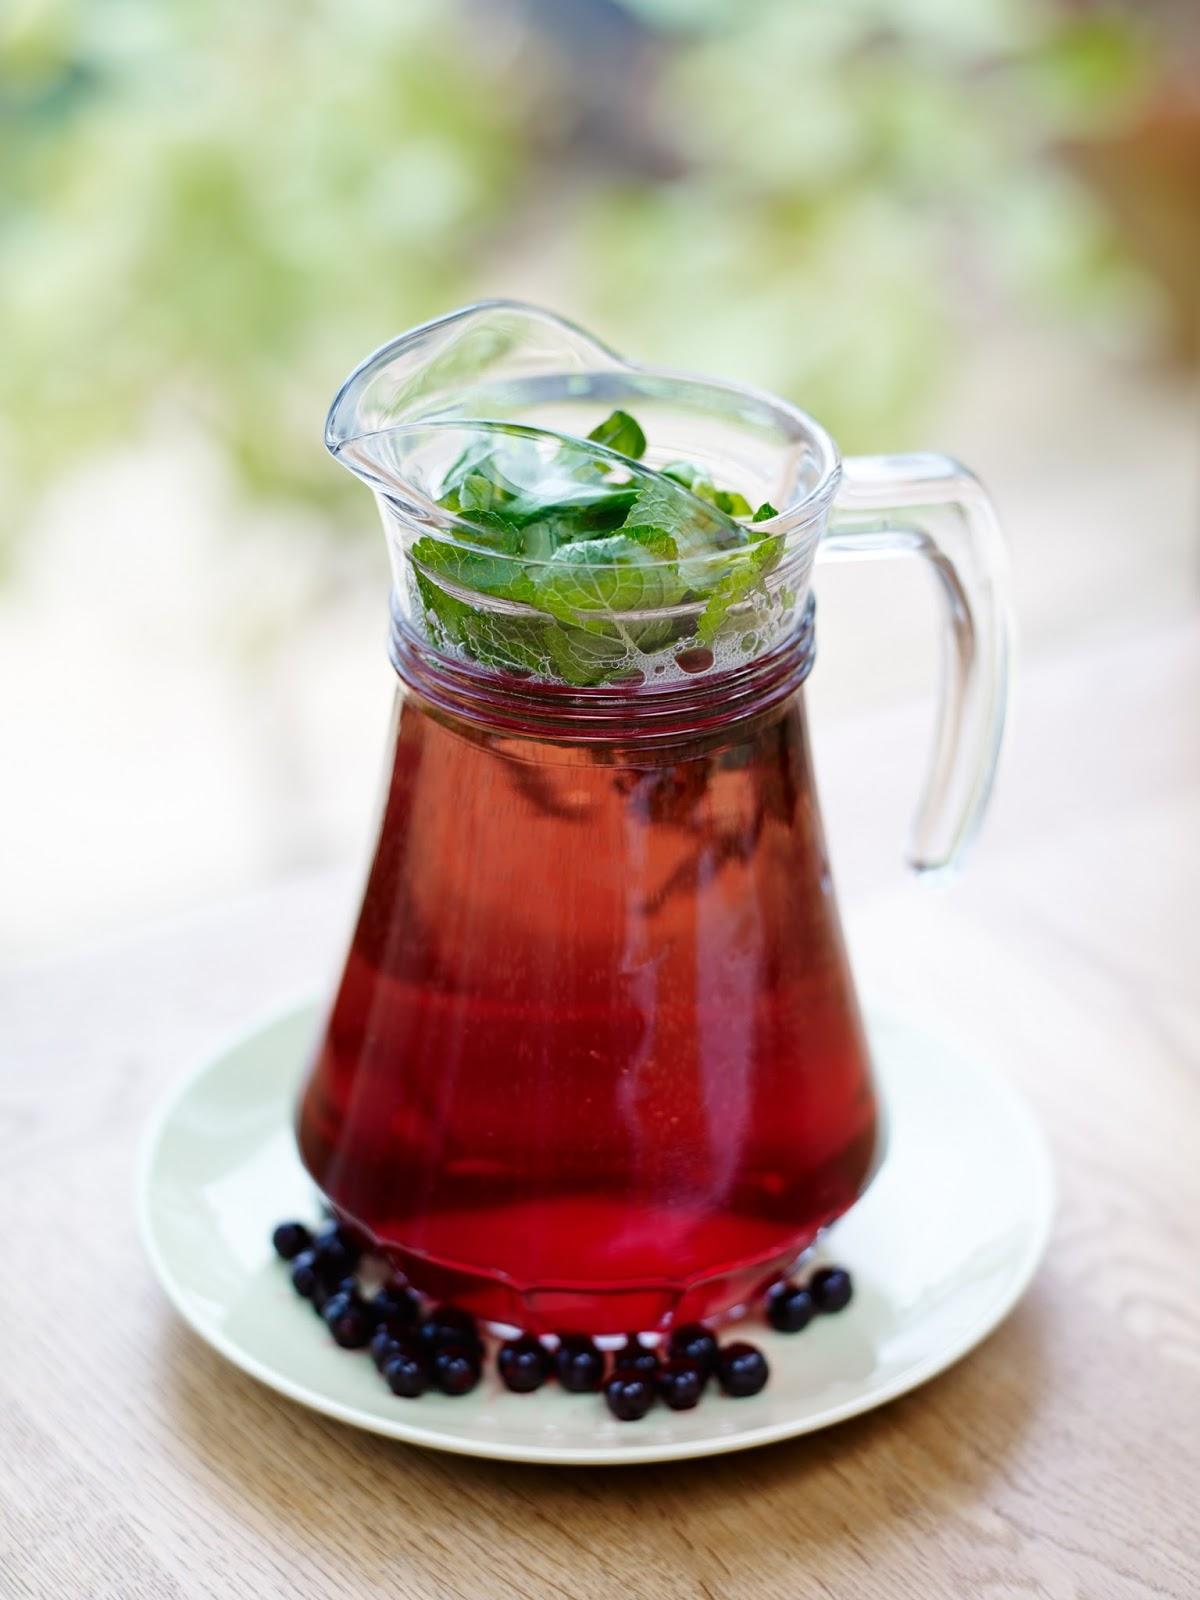 Joe's Wadsack's Blackcurrant Refresher: Prosecco Ideas